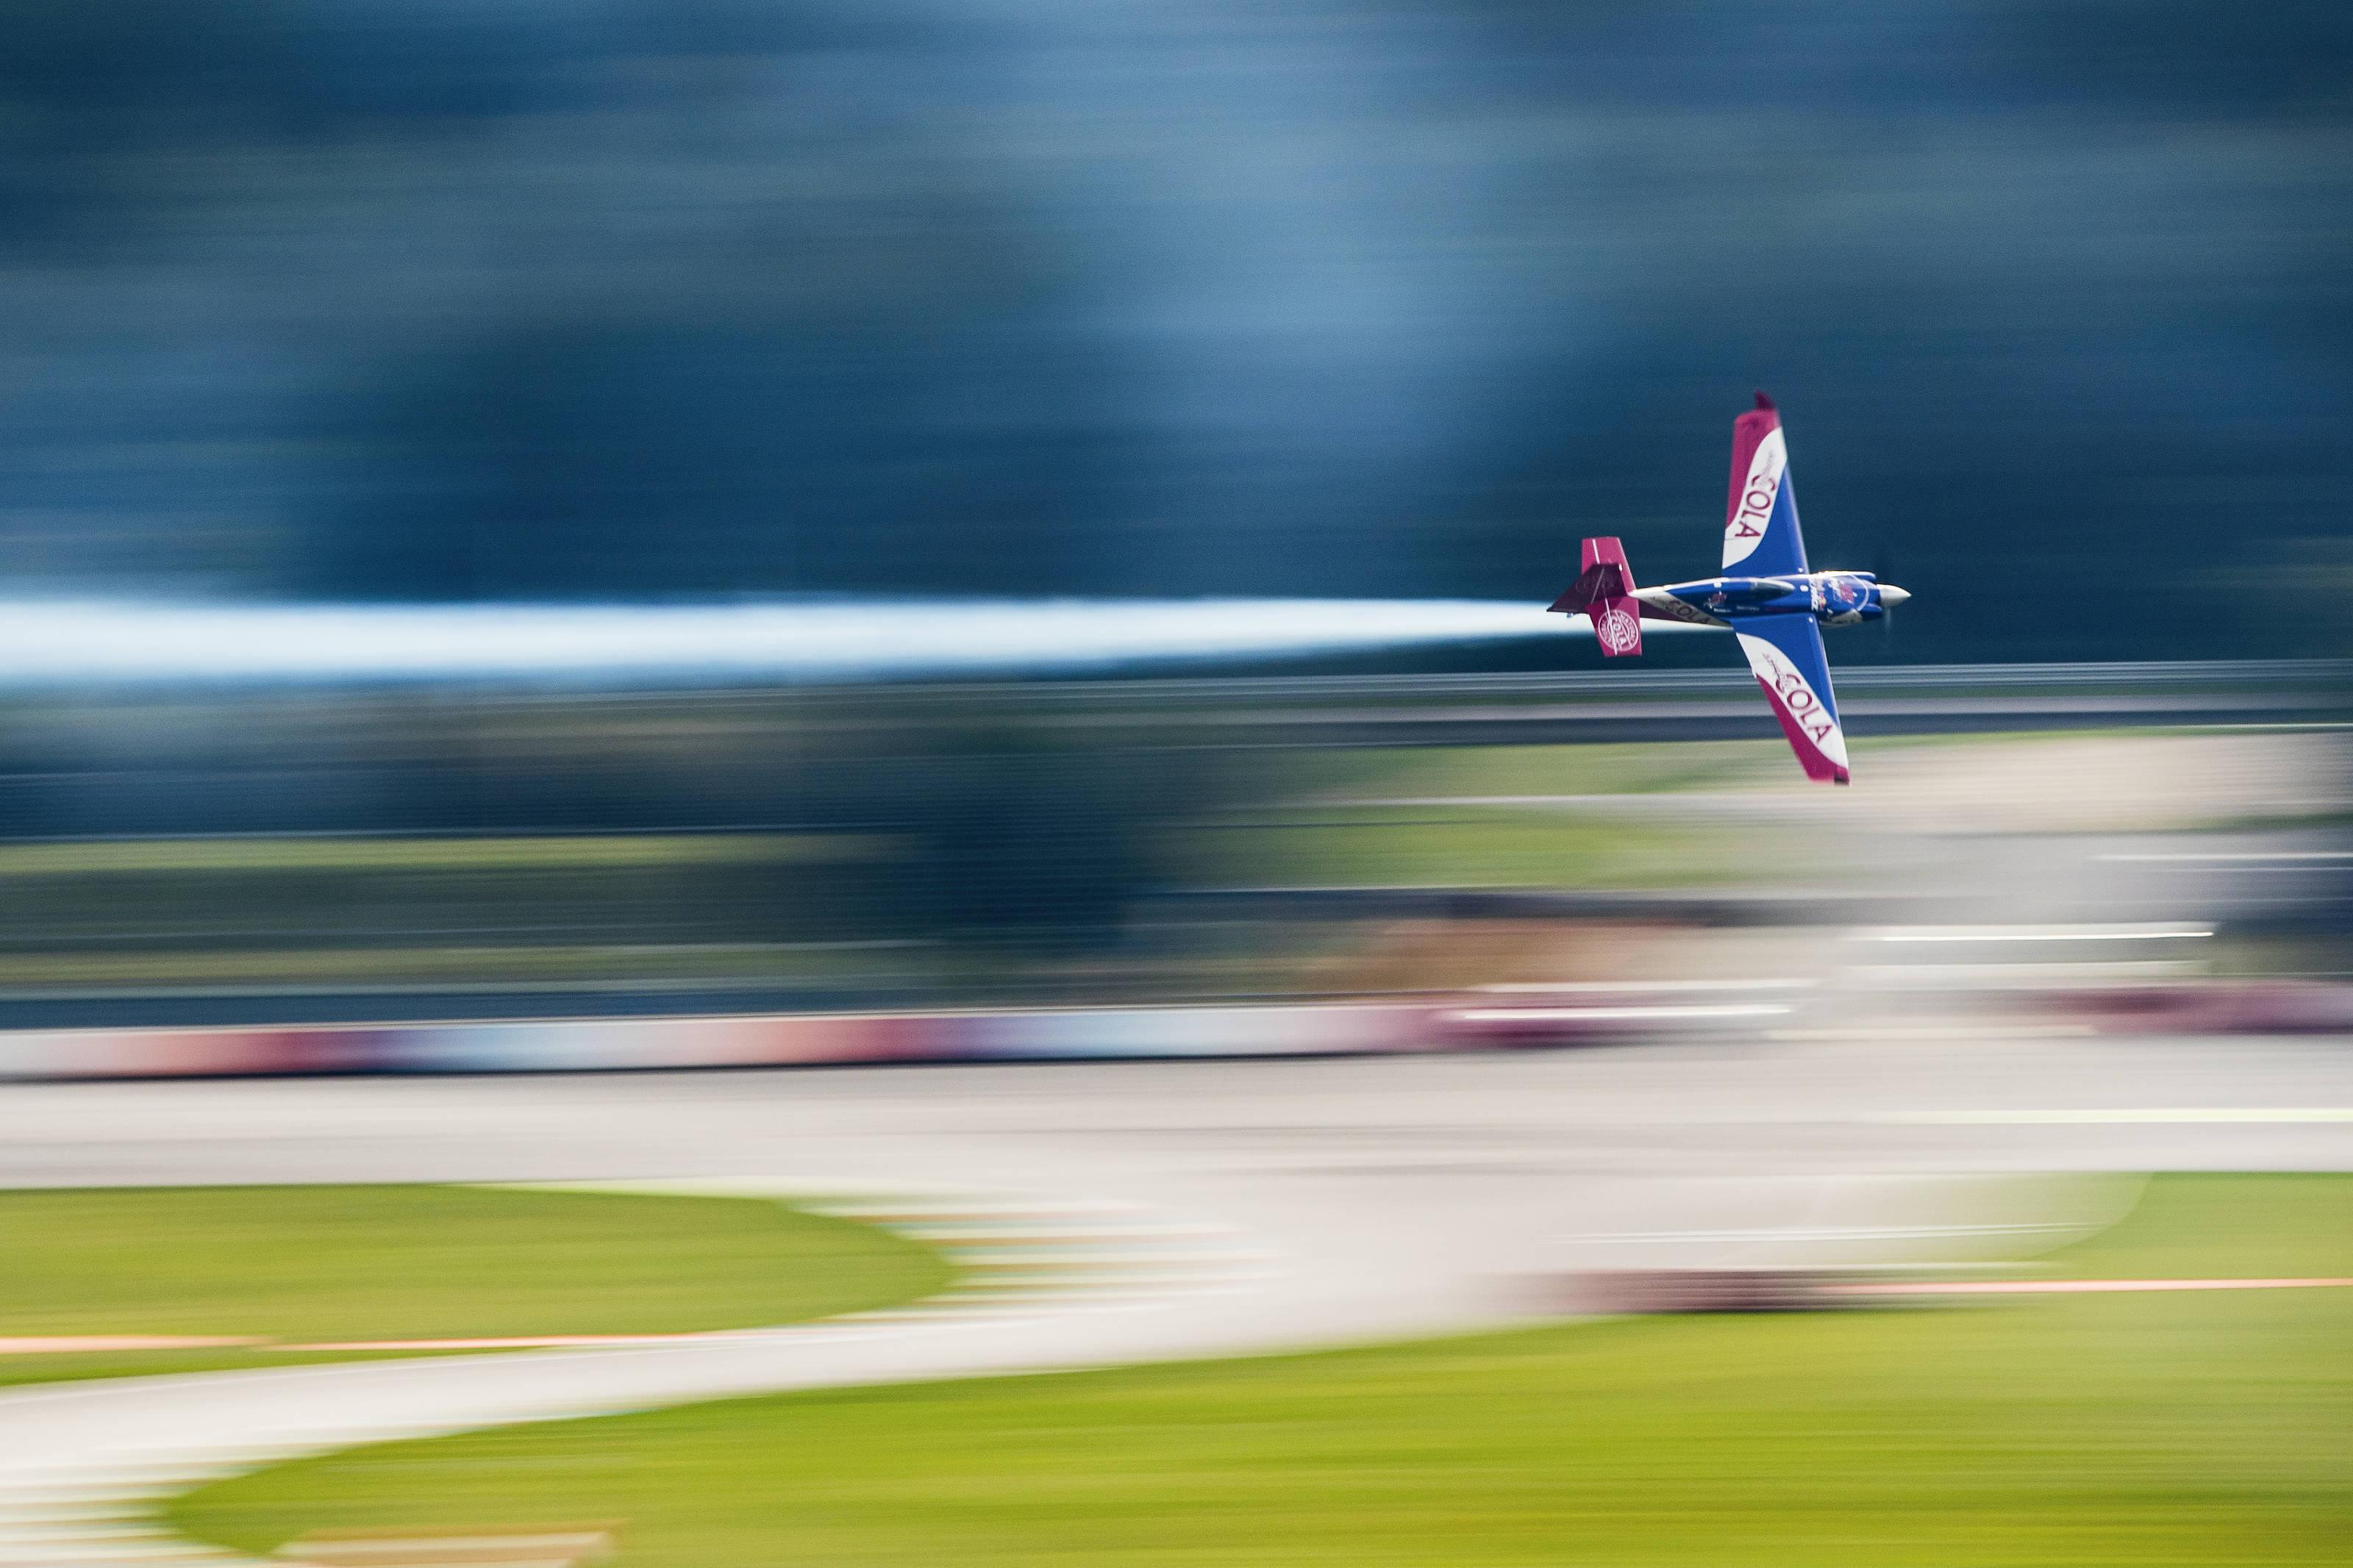 RBAR2017 Lausitz 01209 fot. Samo Vidic Red Bull Content Pool